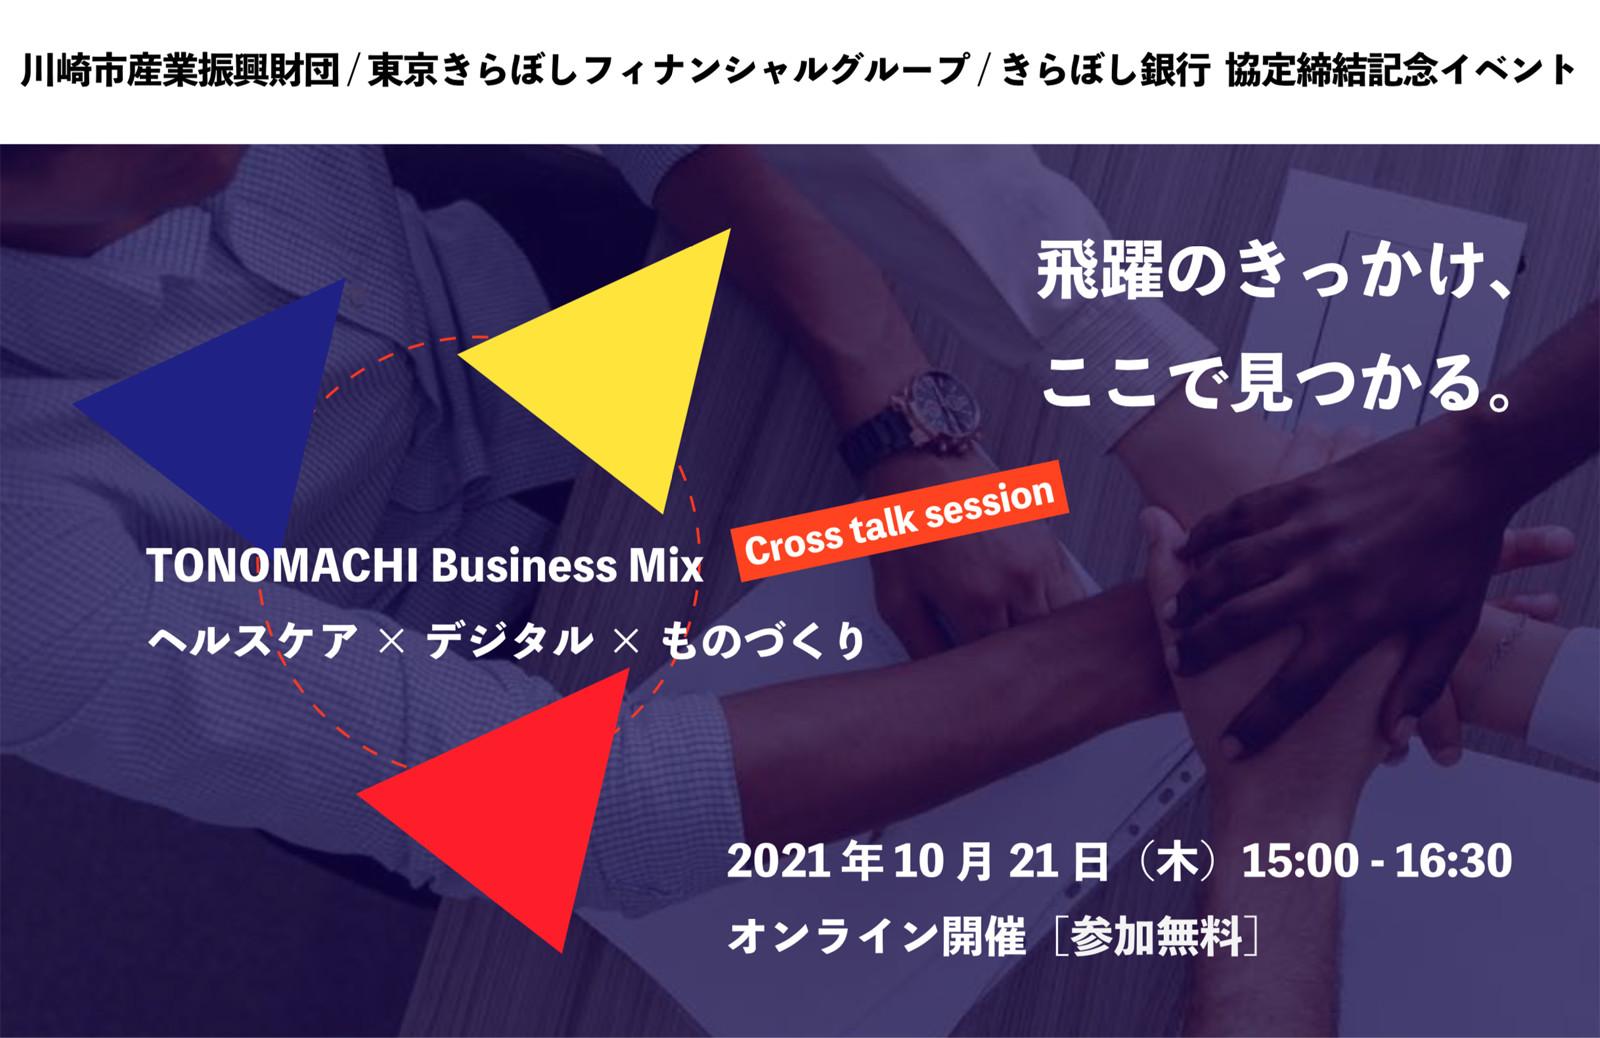 TONOMACHI Business Mix Cross talk session